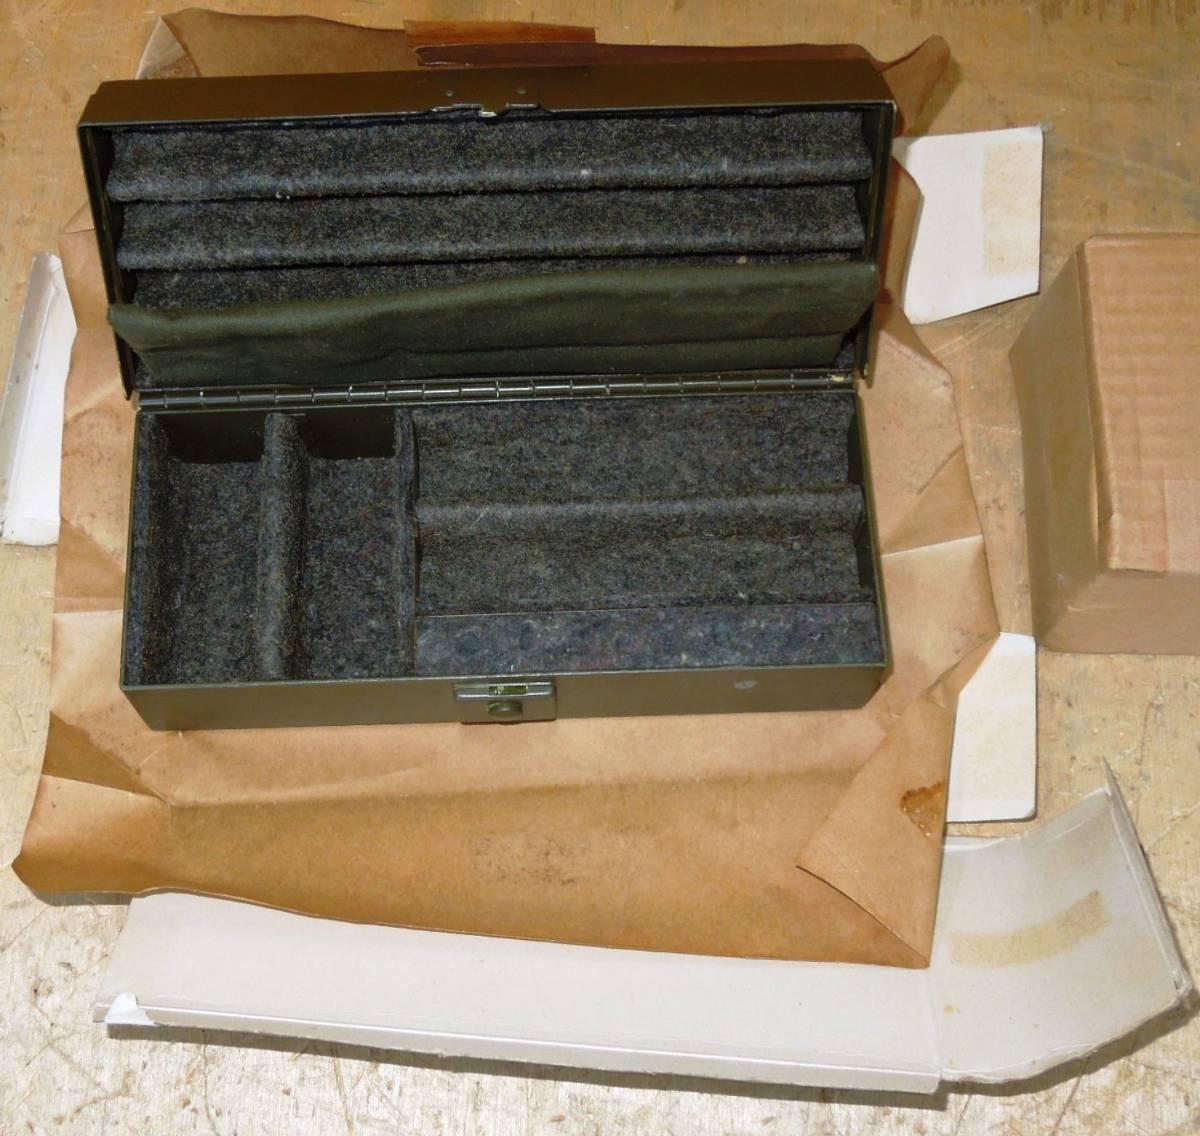 CY-1031/URR 汎用性無線機の予備品箱 未使用品_画像1